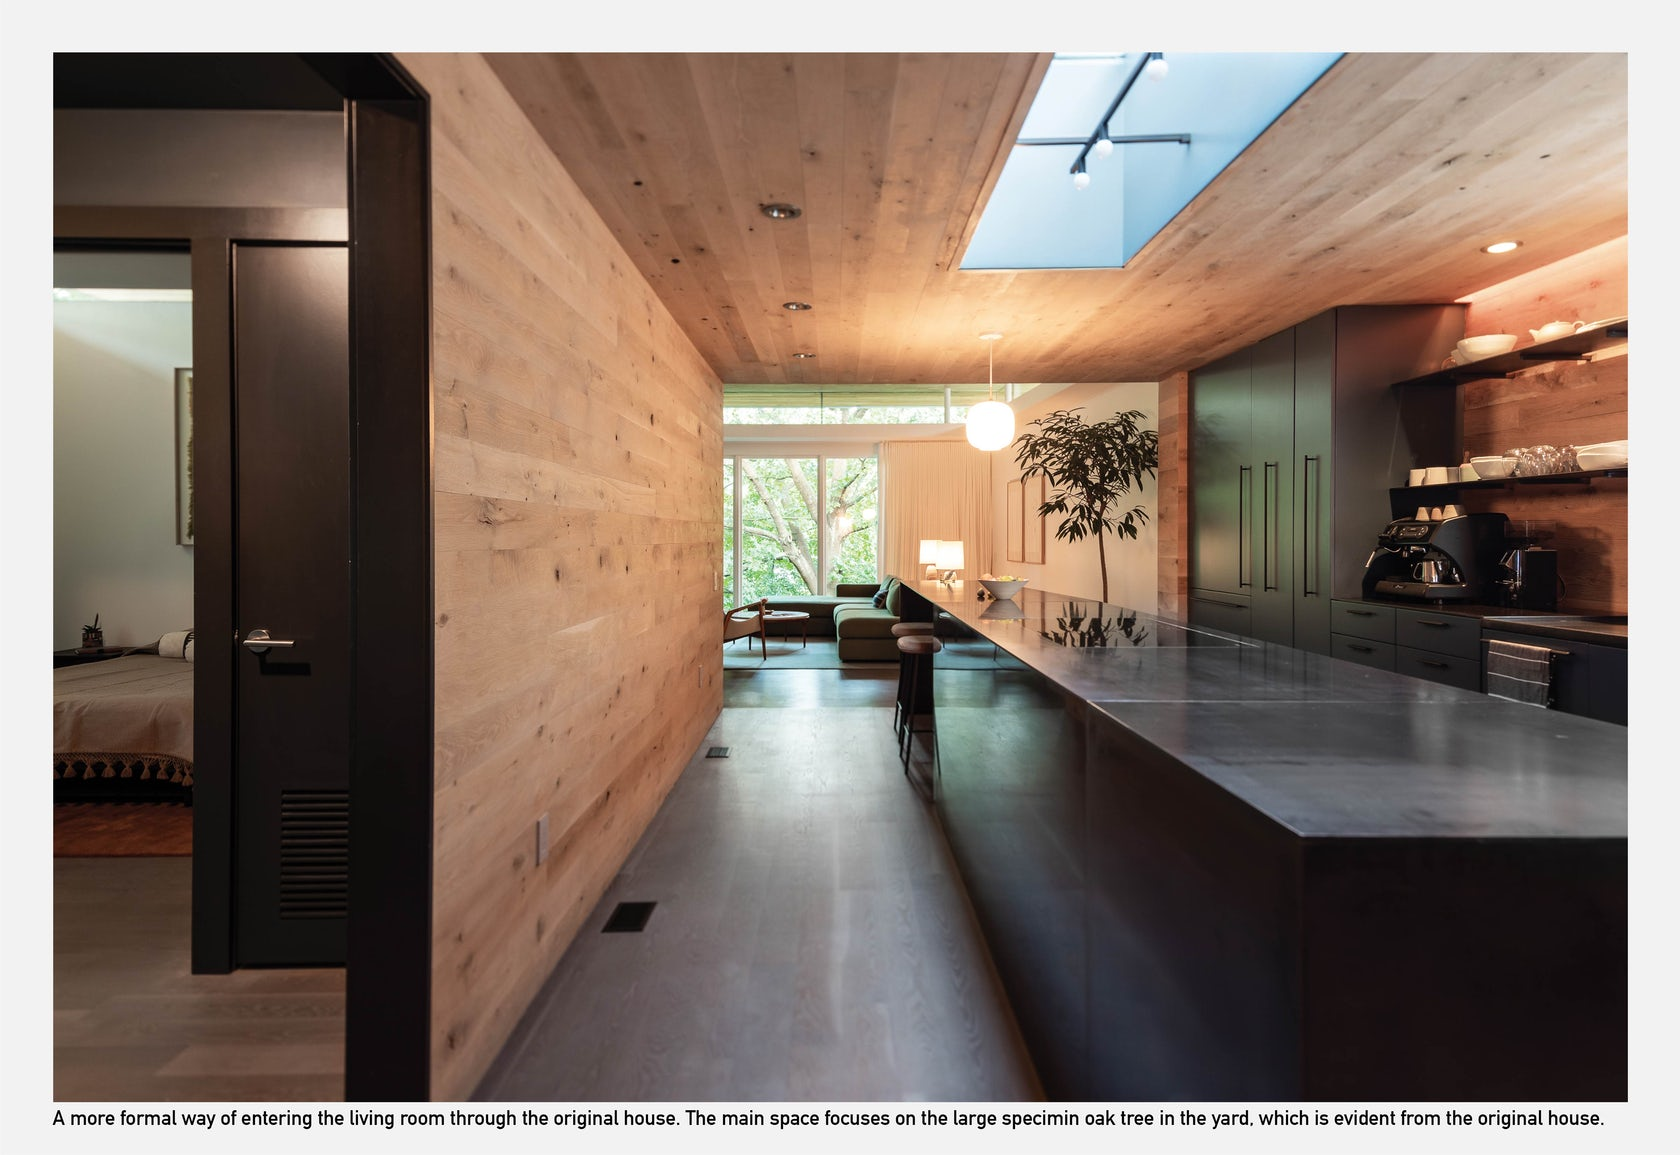 © Webber + Studio, Architects